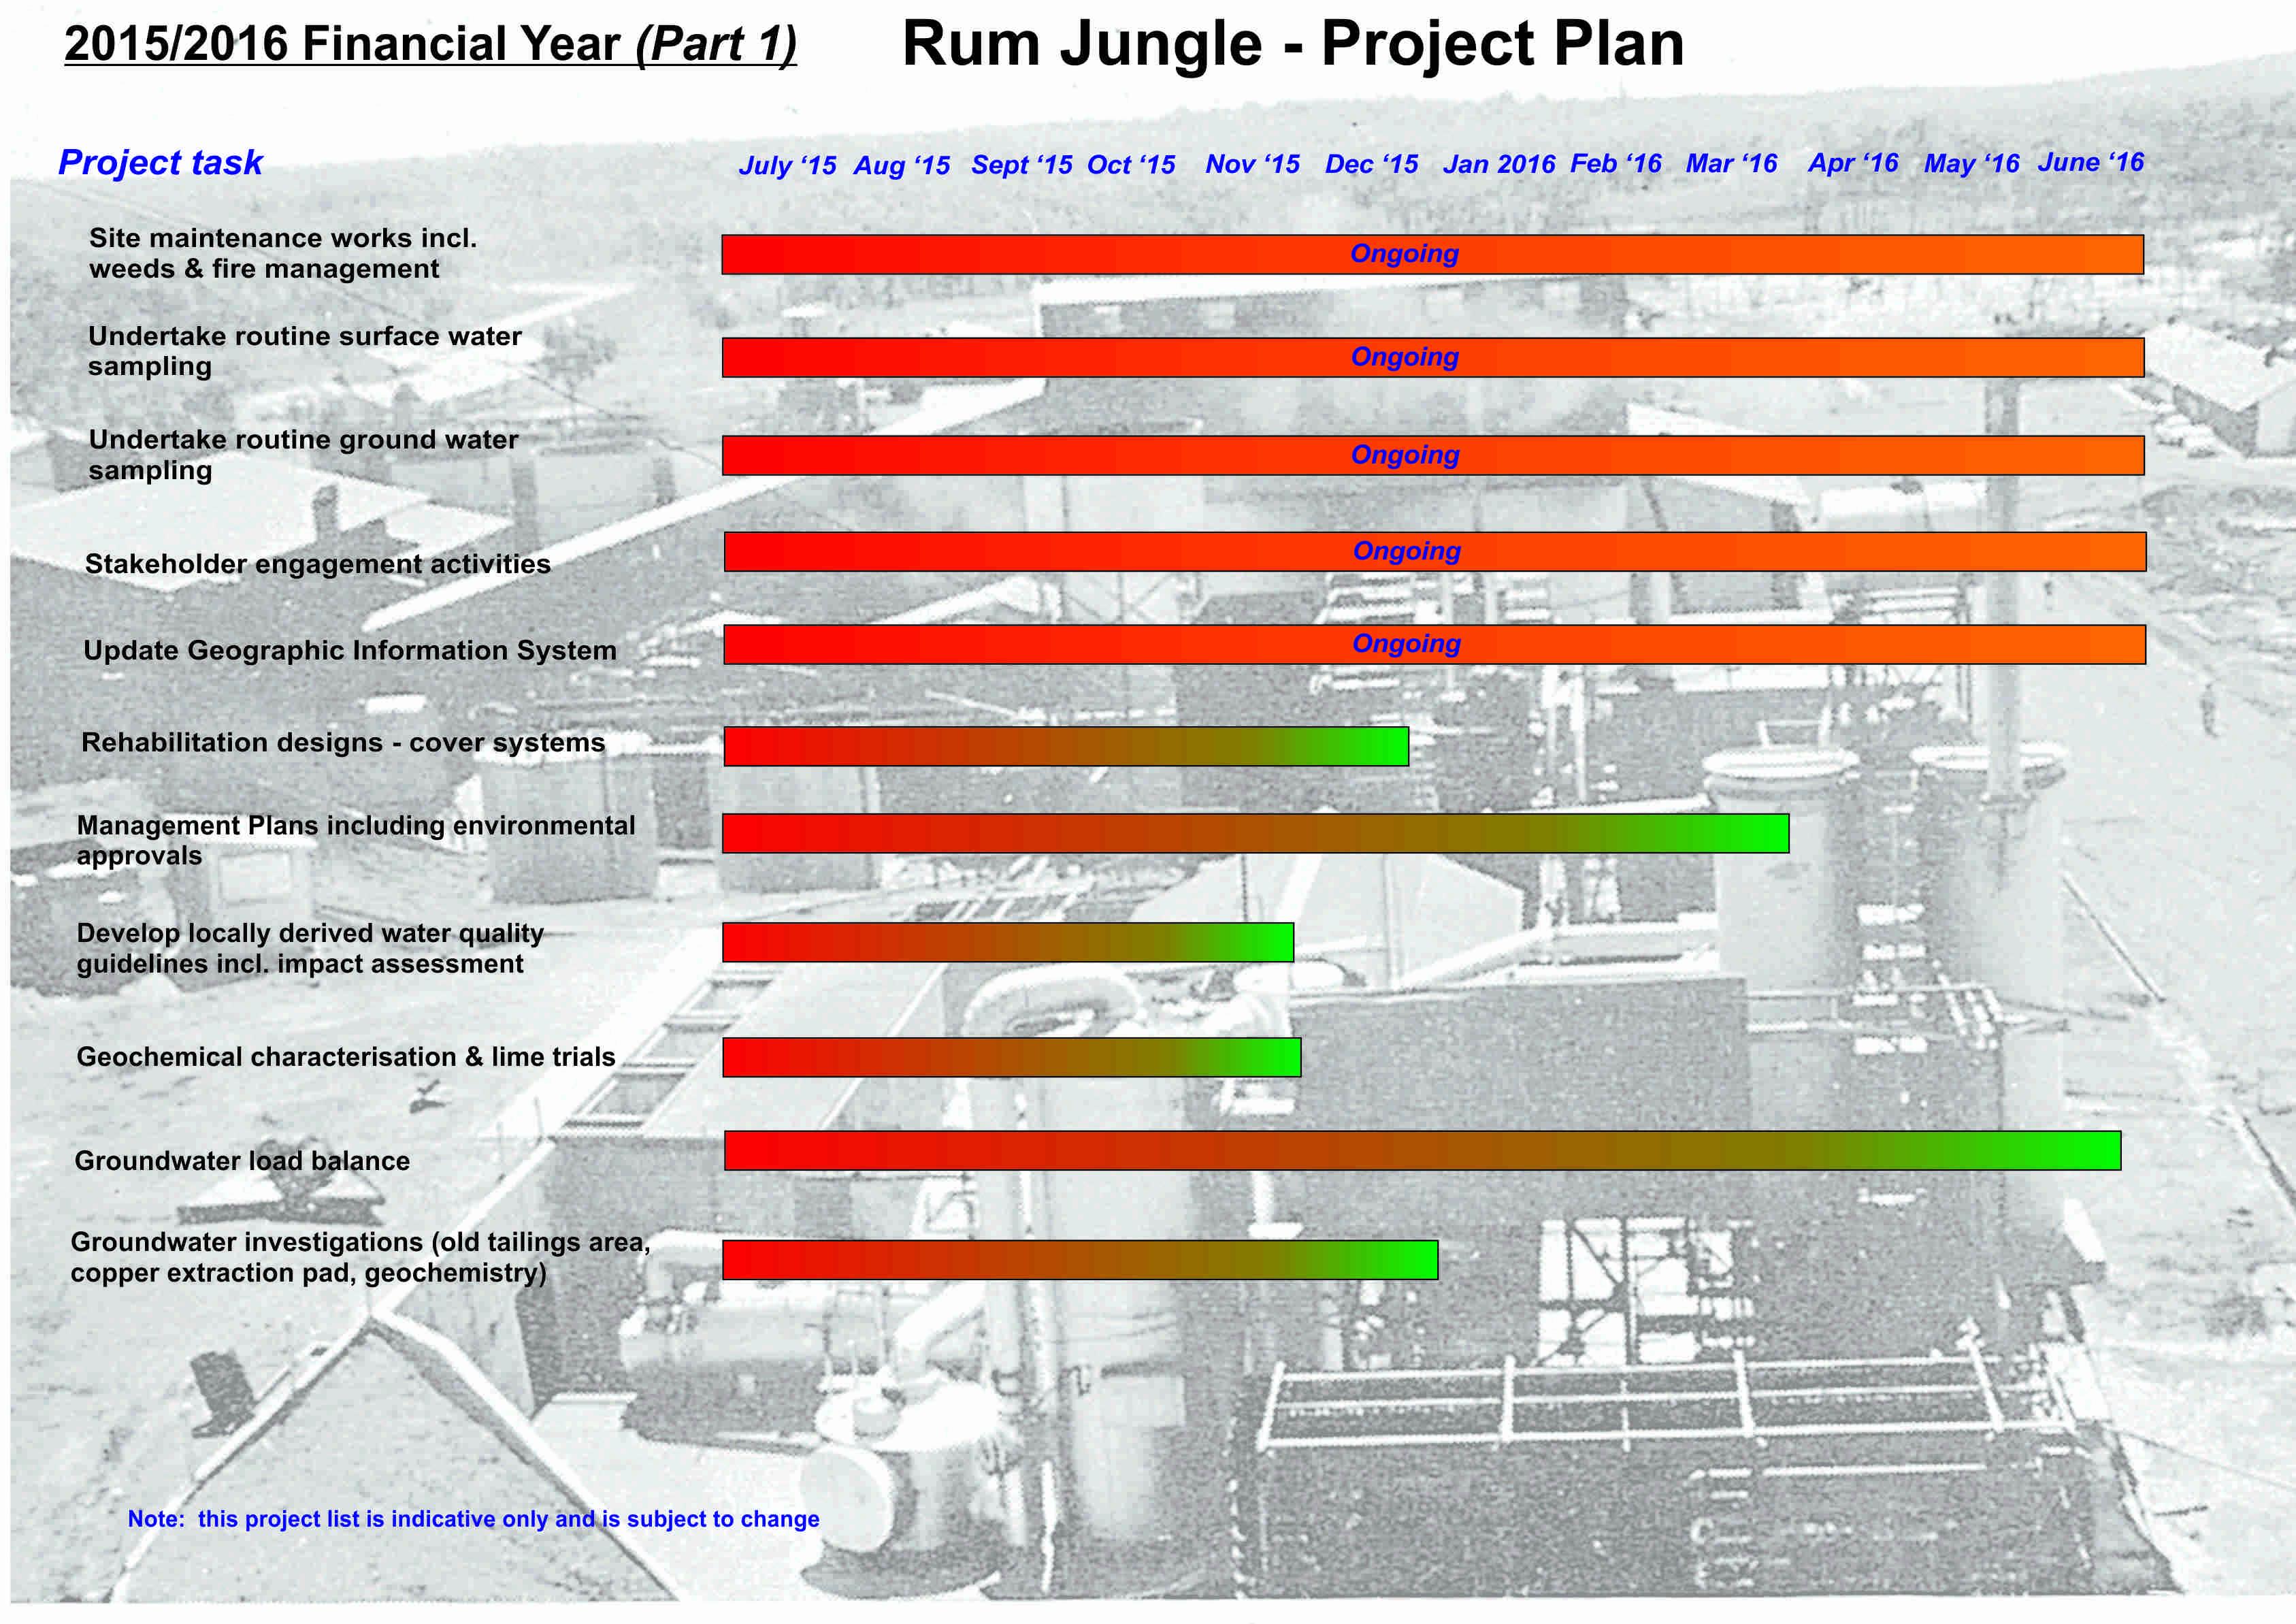 project plan 15-16 (part 1)